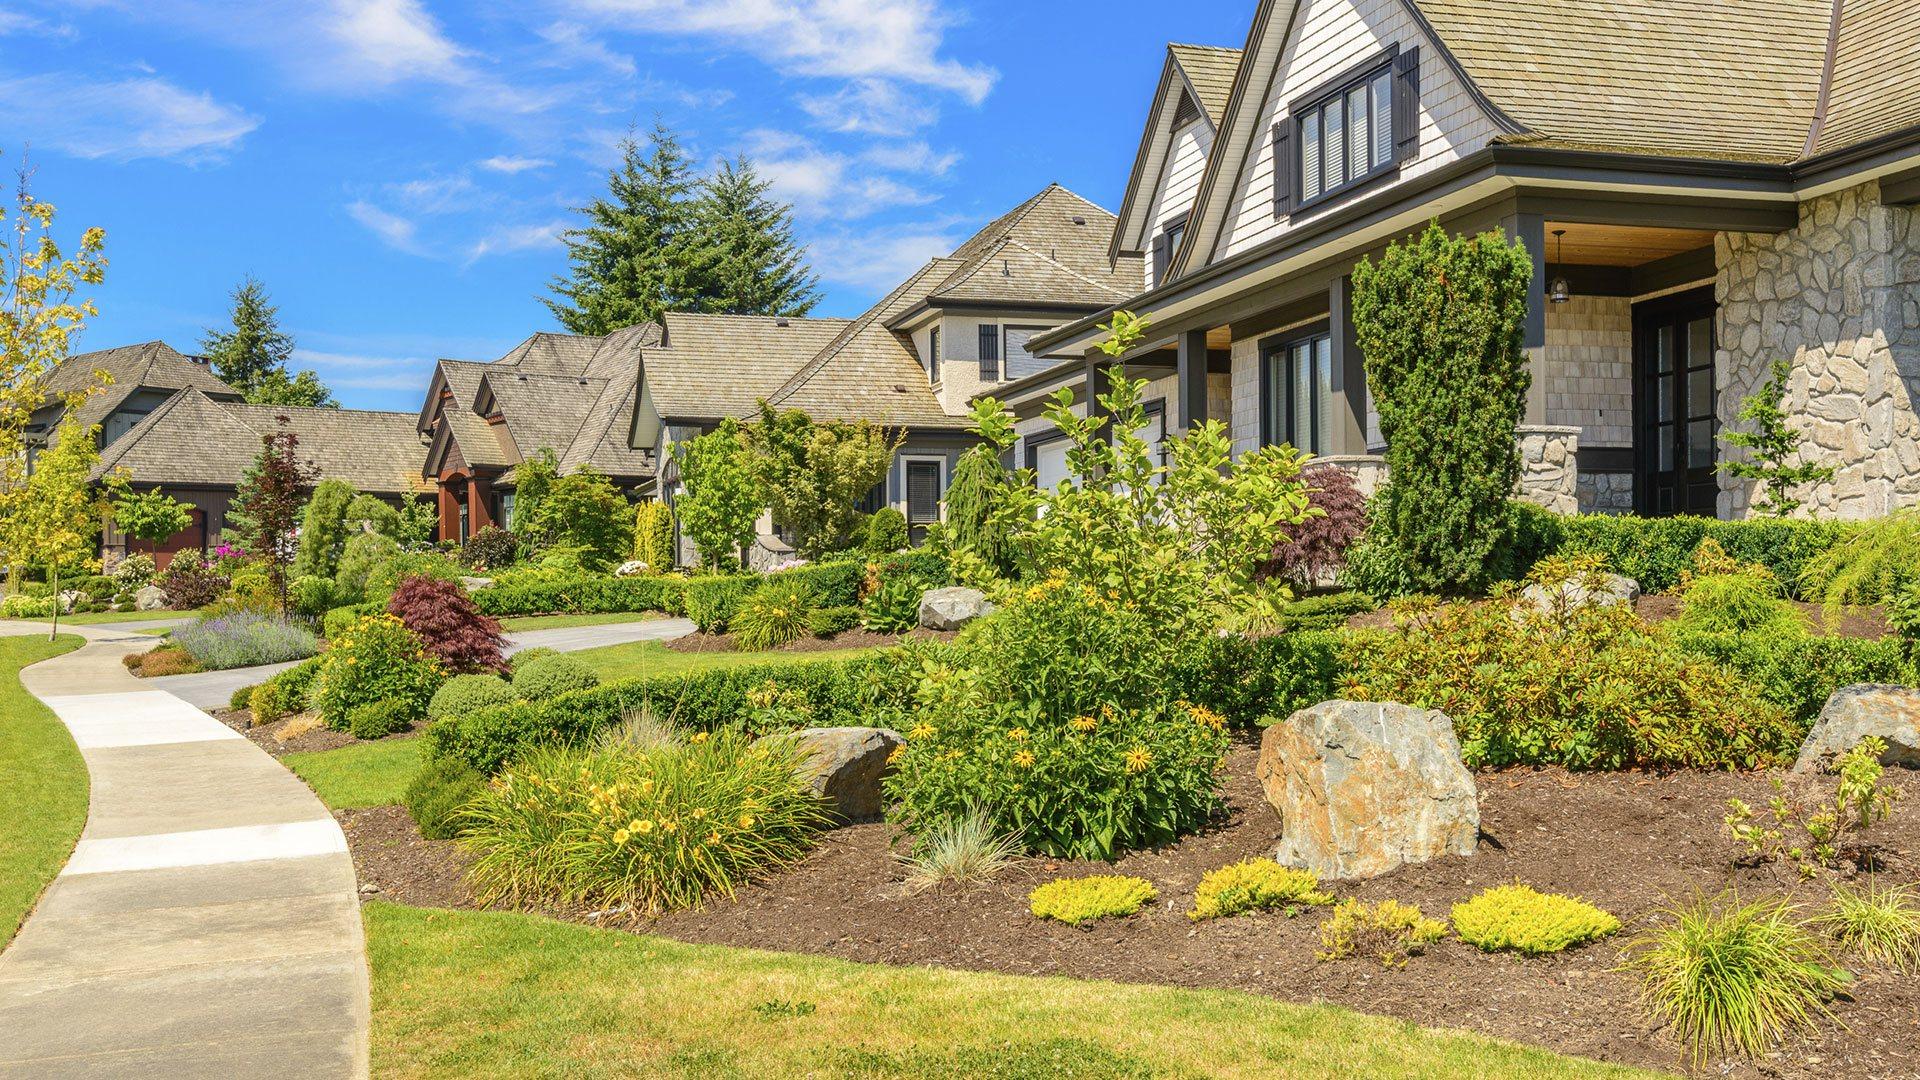 Dakota Turf Landscaping Company, Landscaper and Landscaping Services slide 2